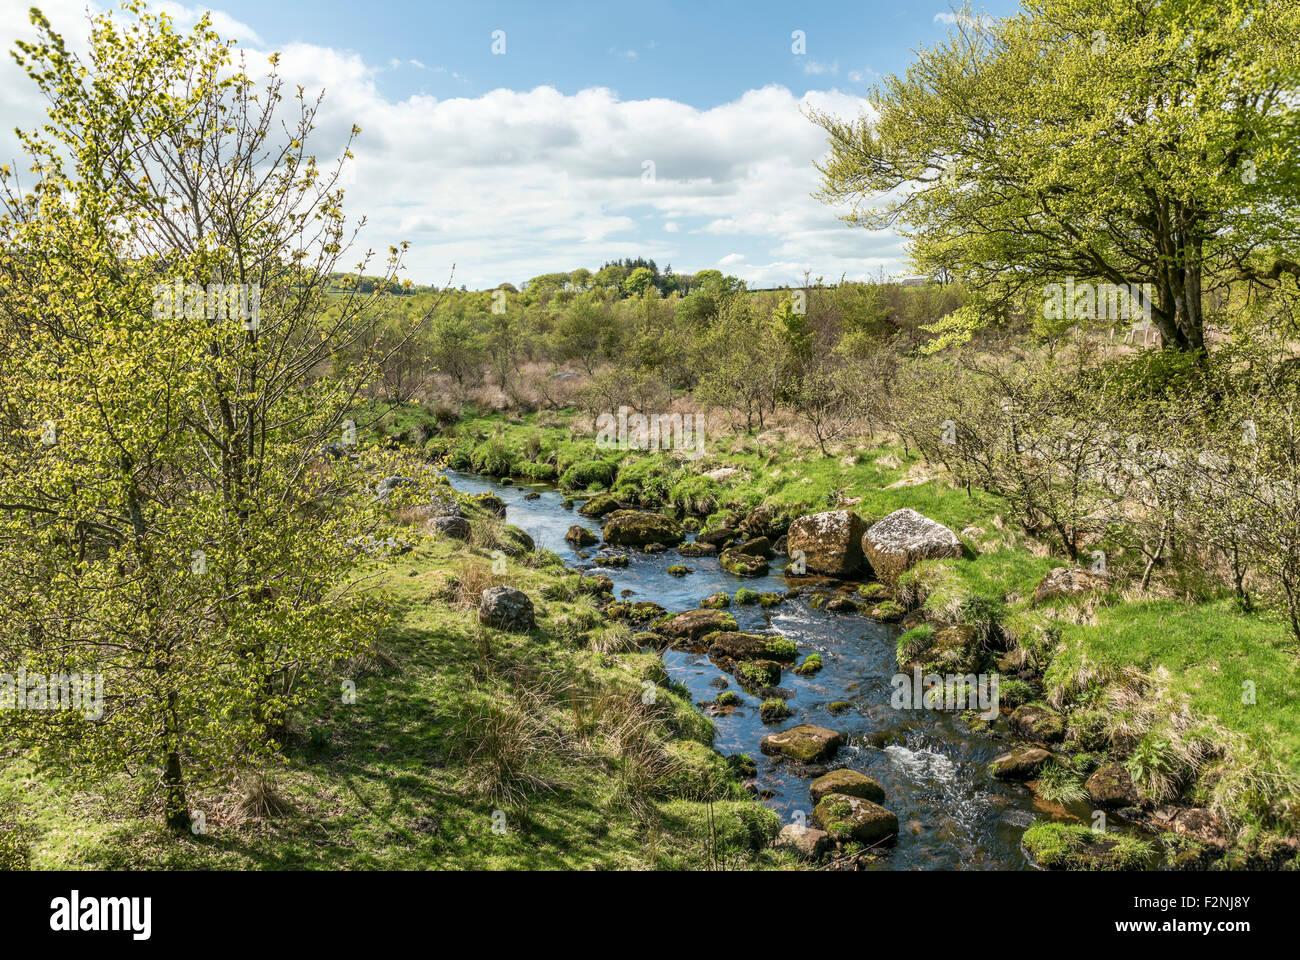 Landschaft im Nationalpark Dartmoor, Devon, England, UK   Landschaft Im Nationalpark Dartmoor, Devon, England, UK Stockbild